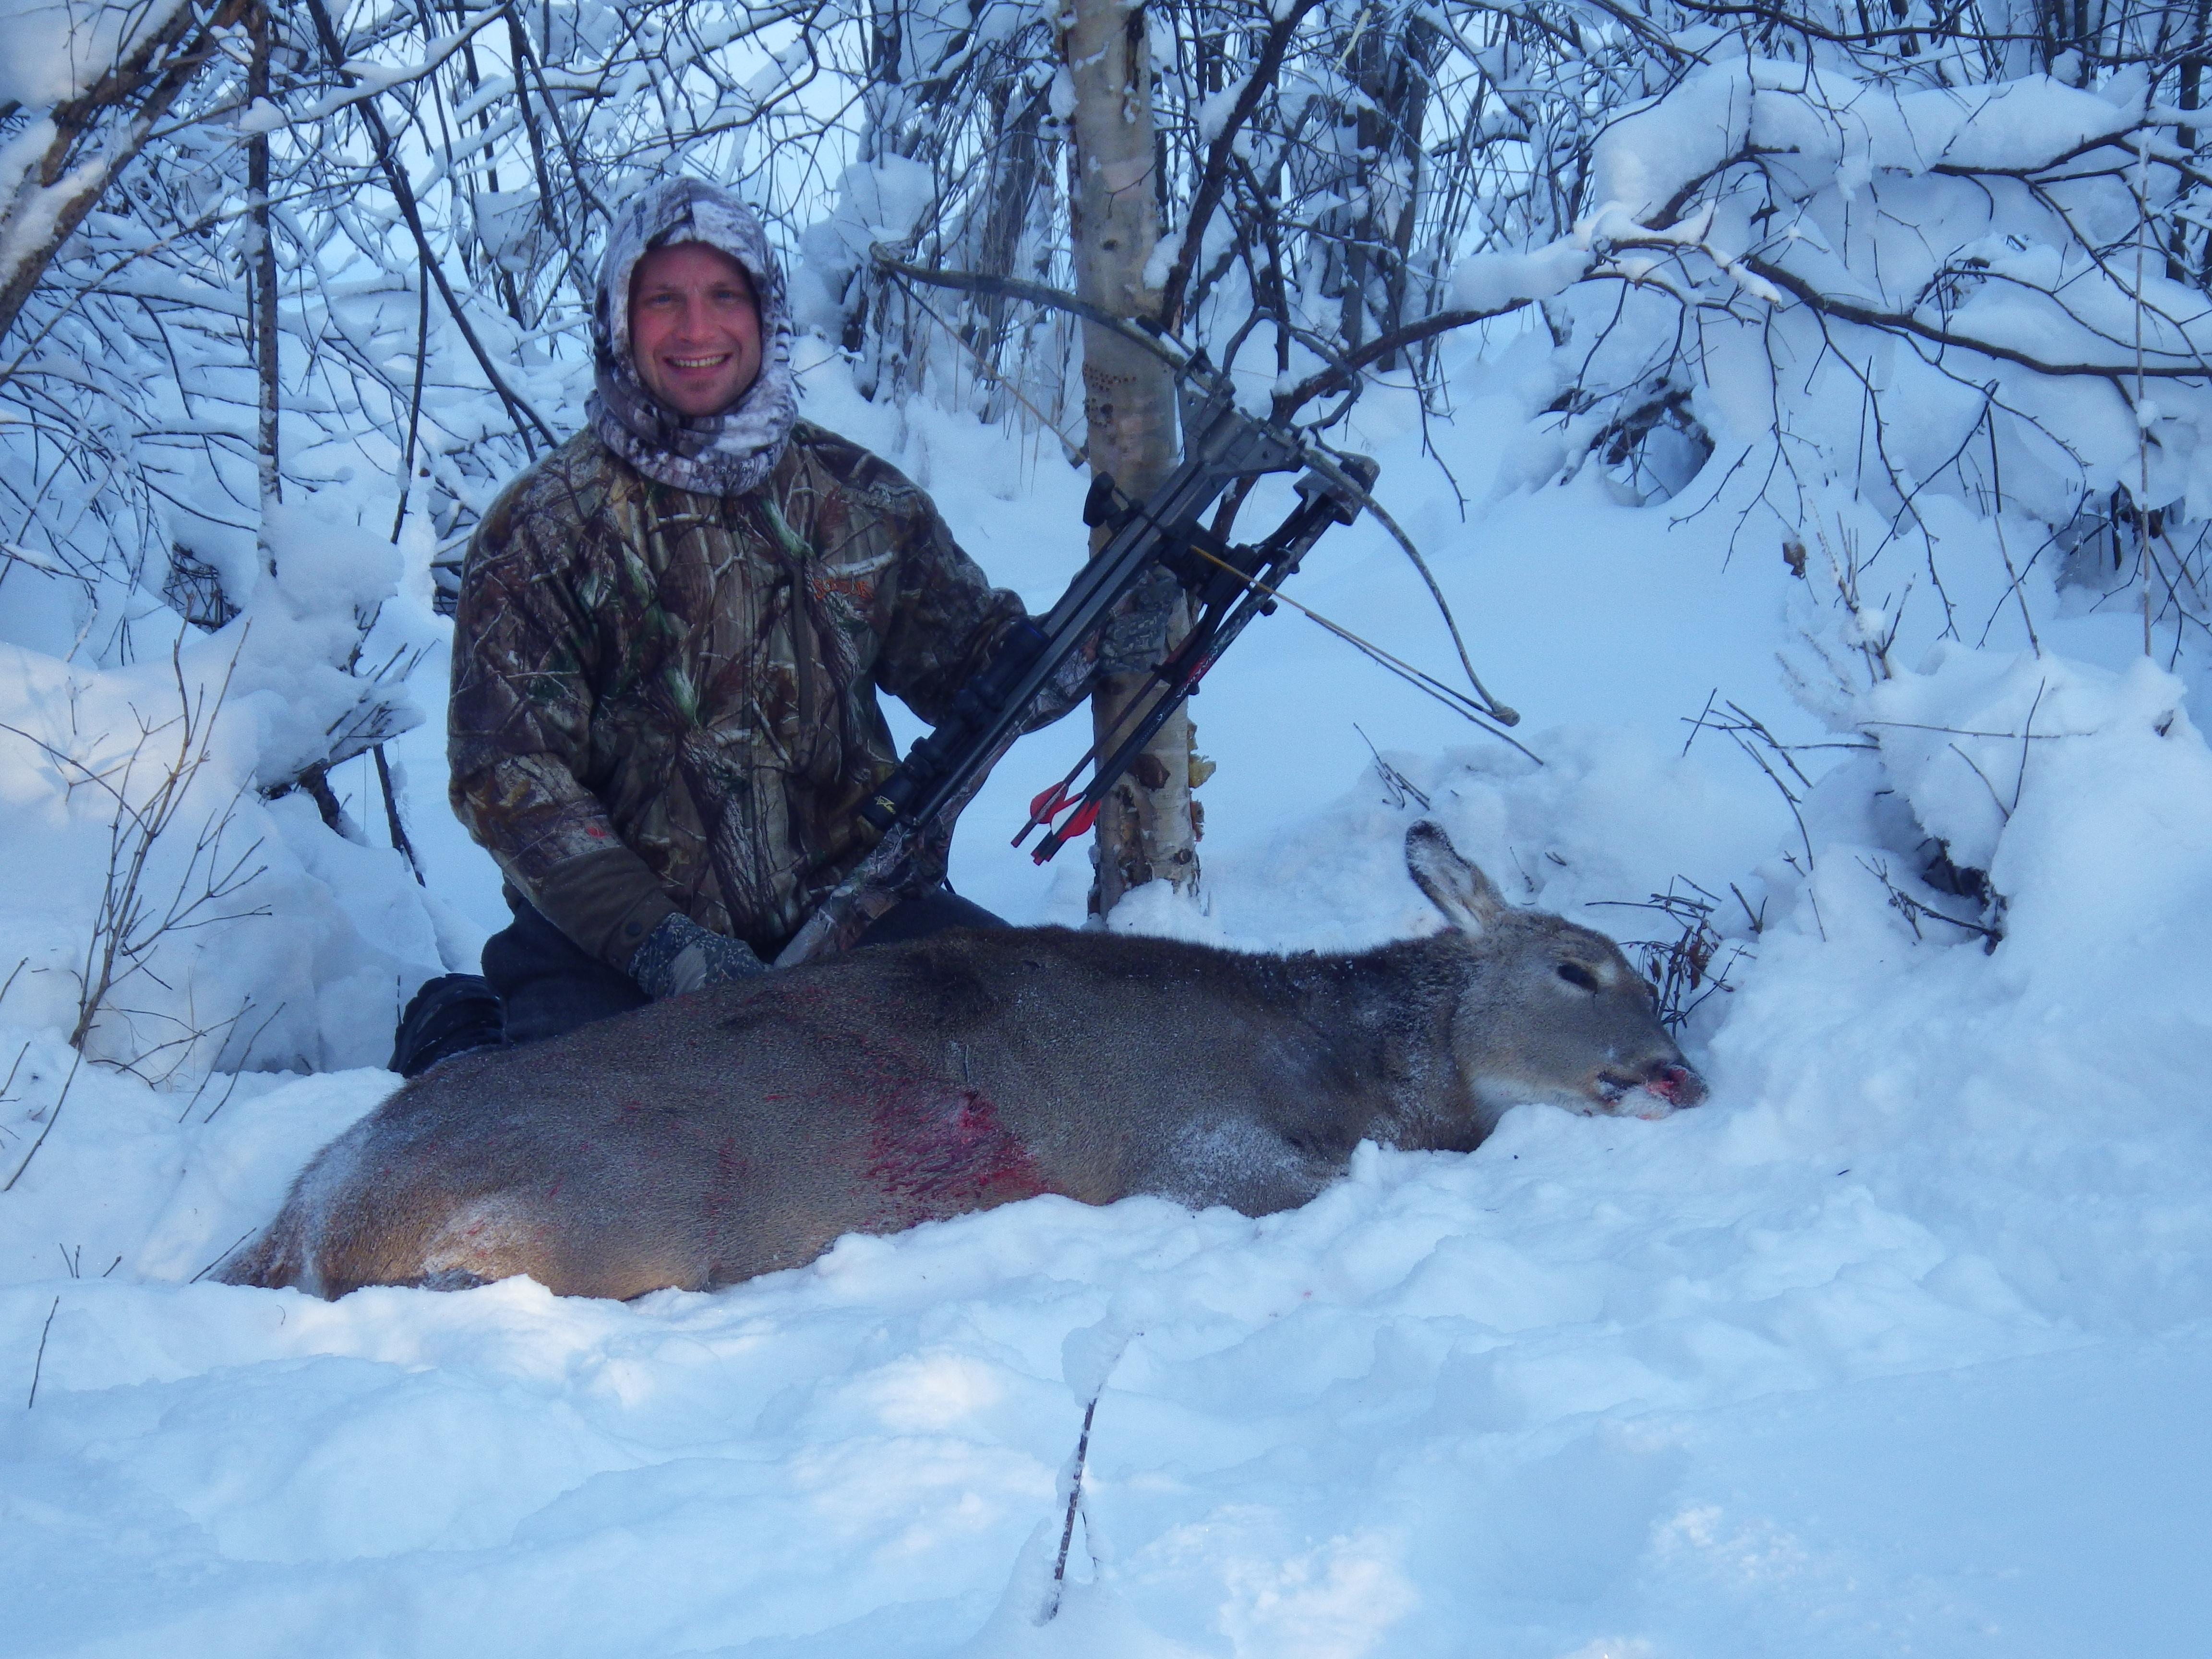 Hunter success